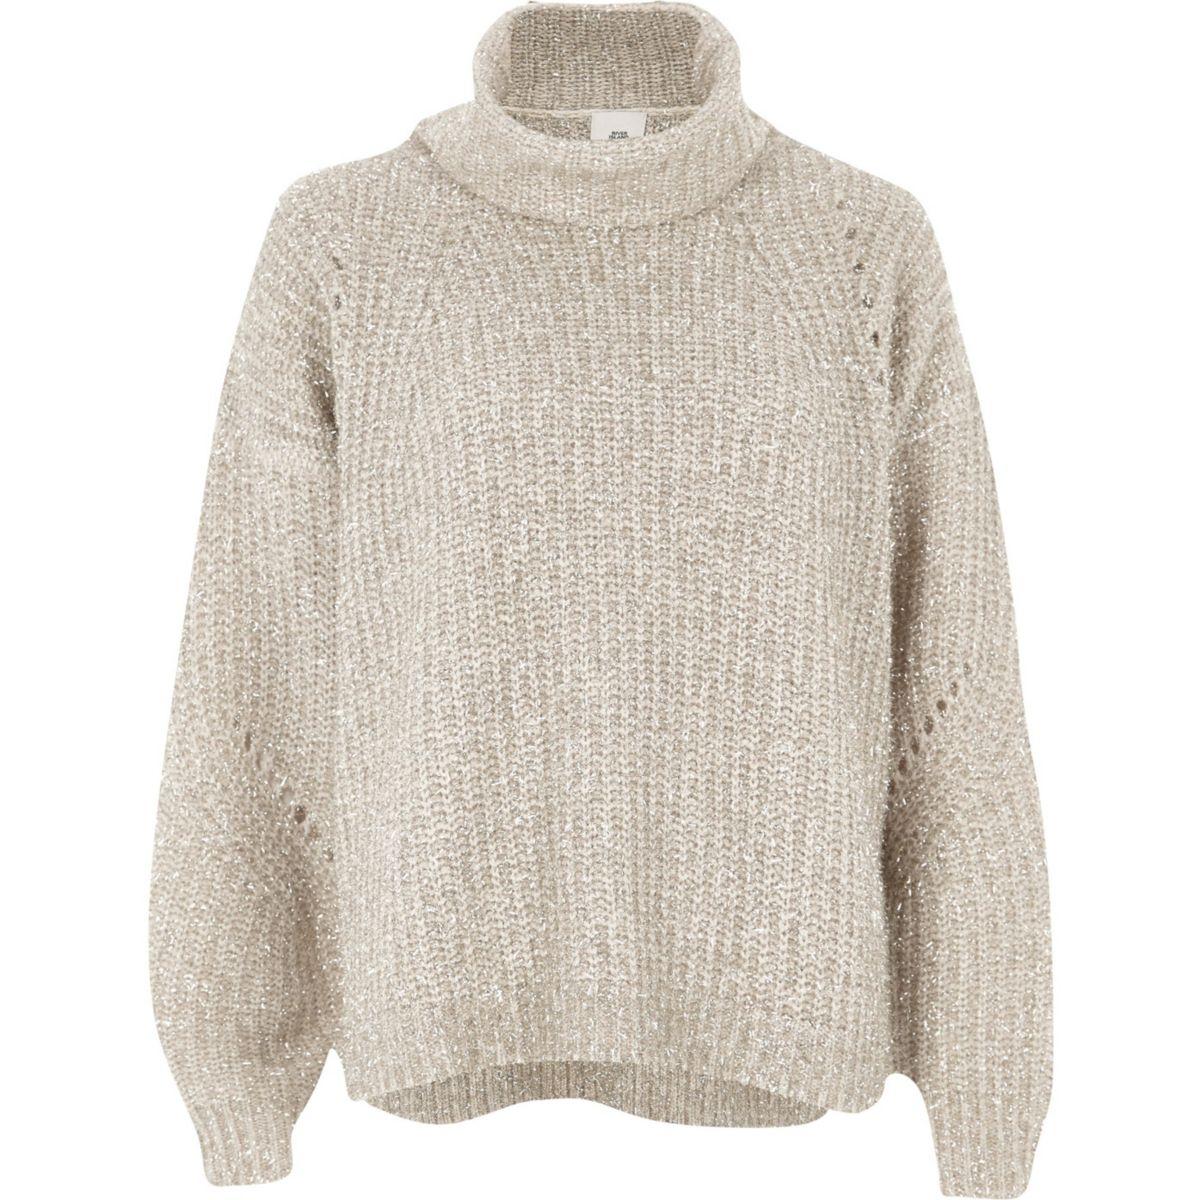 Gold lurex stitch roll neck knit sweater